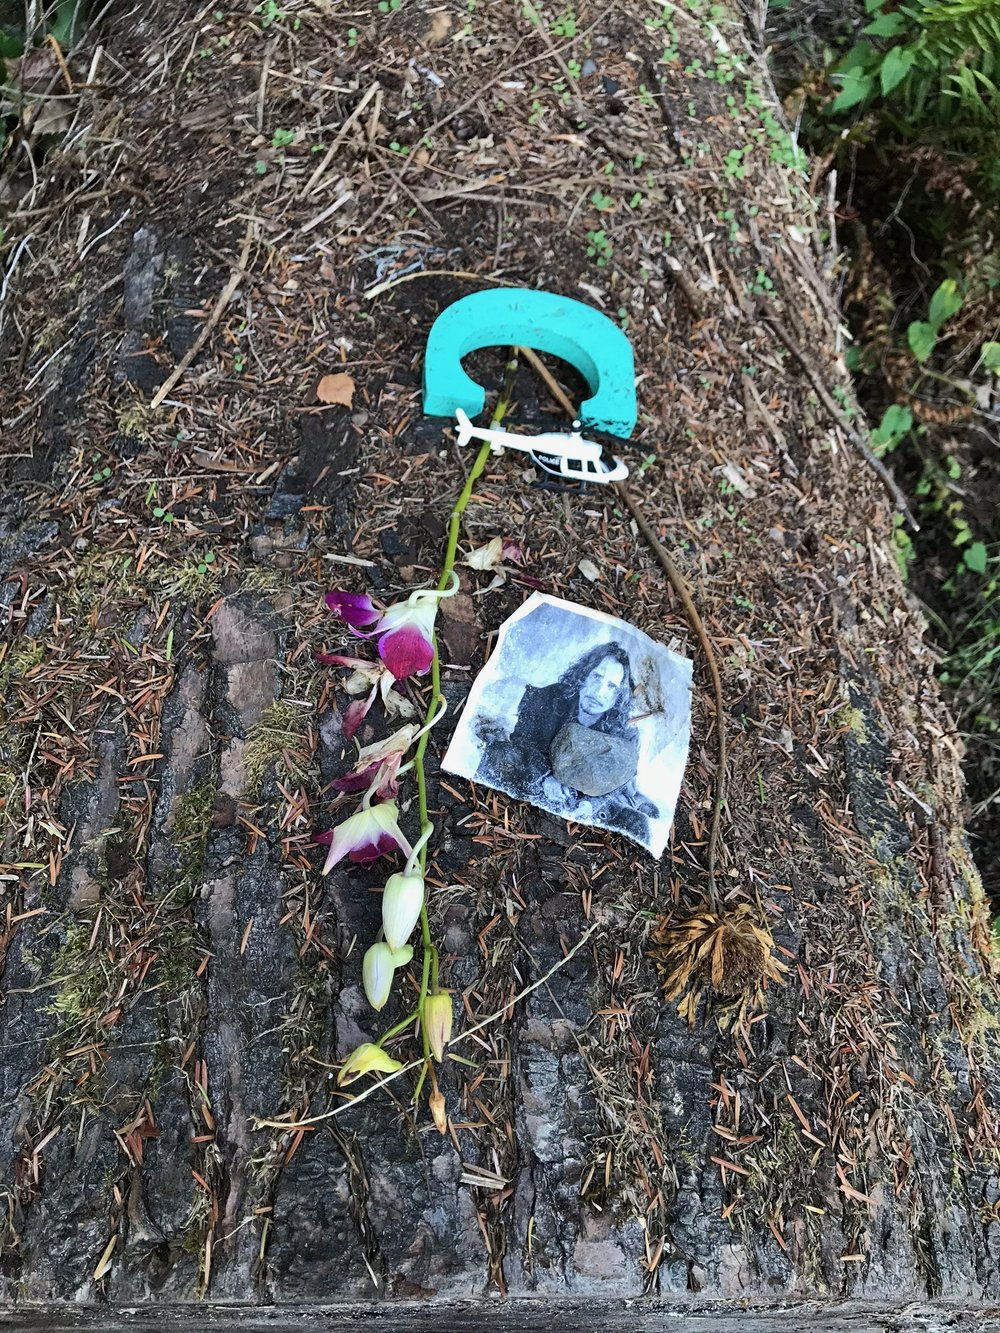 Left a the unofficial Kurt Cobain memorial at Virreta Park